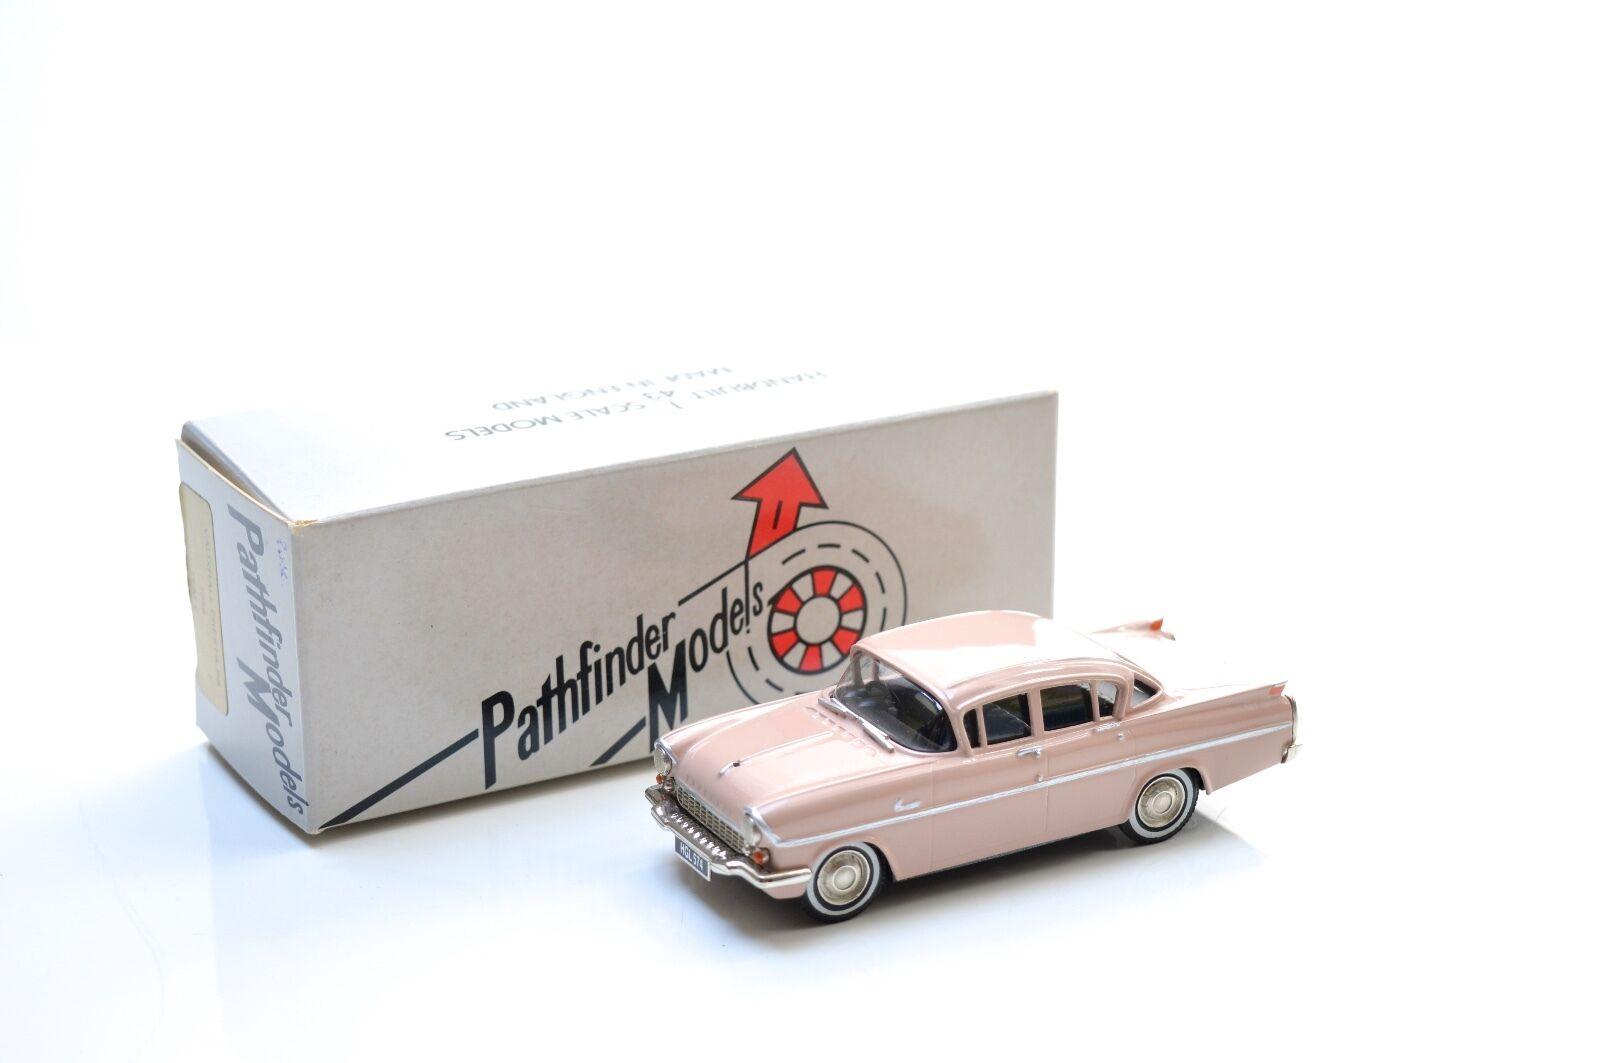 PATHFINDER MODELS PFM 6 VAUXHALL CREAST PA 1958